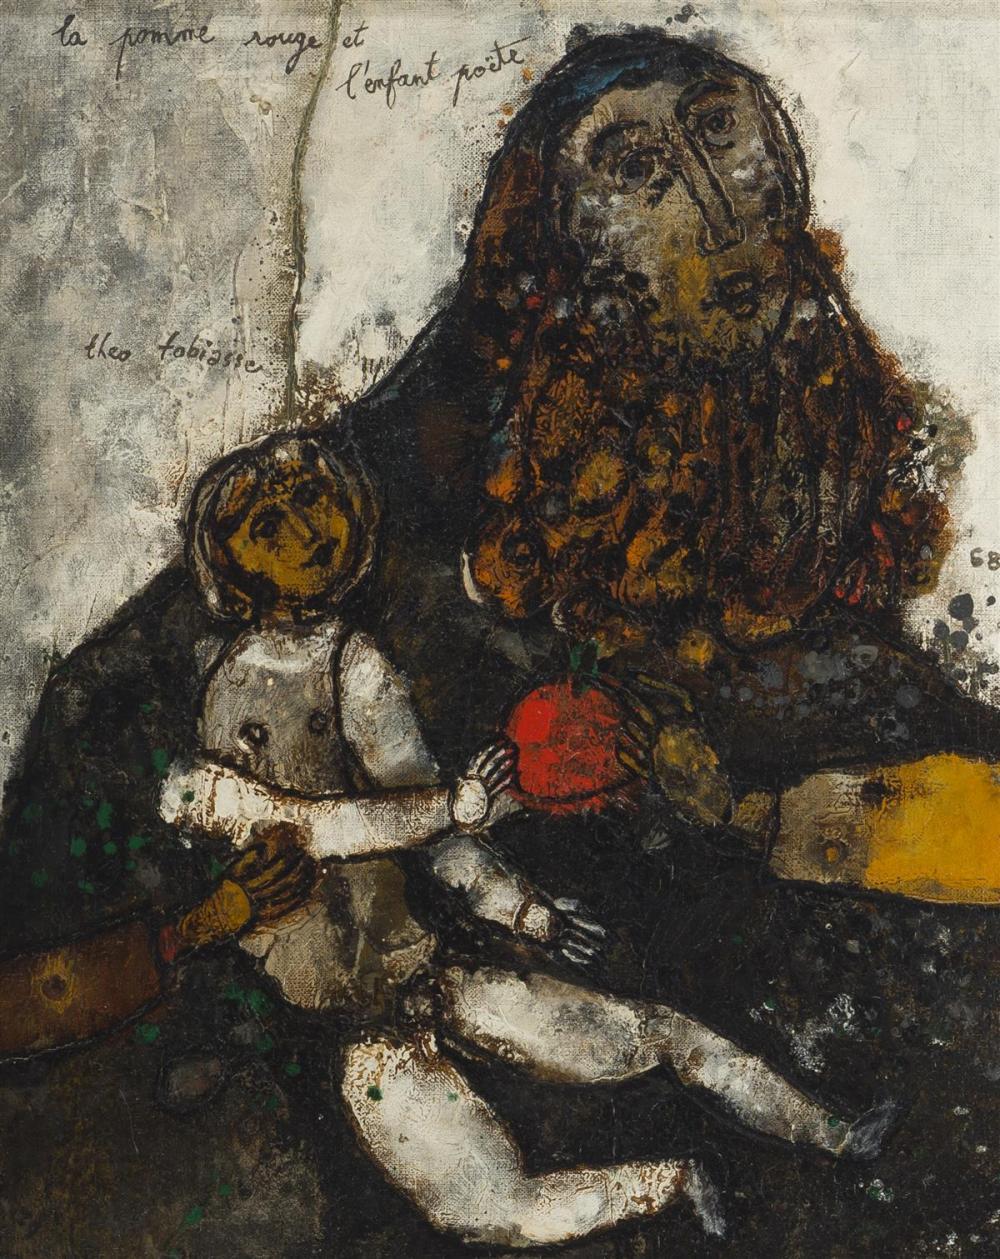 "Theo Tobiasse, (1927-2012 French), ""La Pomme Rouge et L'Enfant Poete,"" 1968, Oil on canvas laid to waxed canvas, 18"" H x 15"" W"